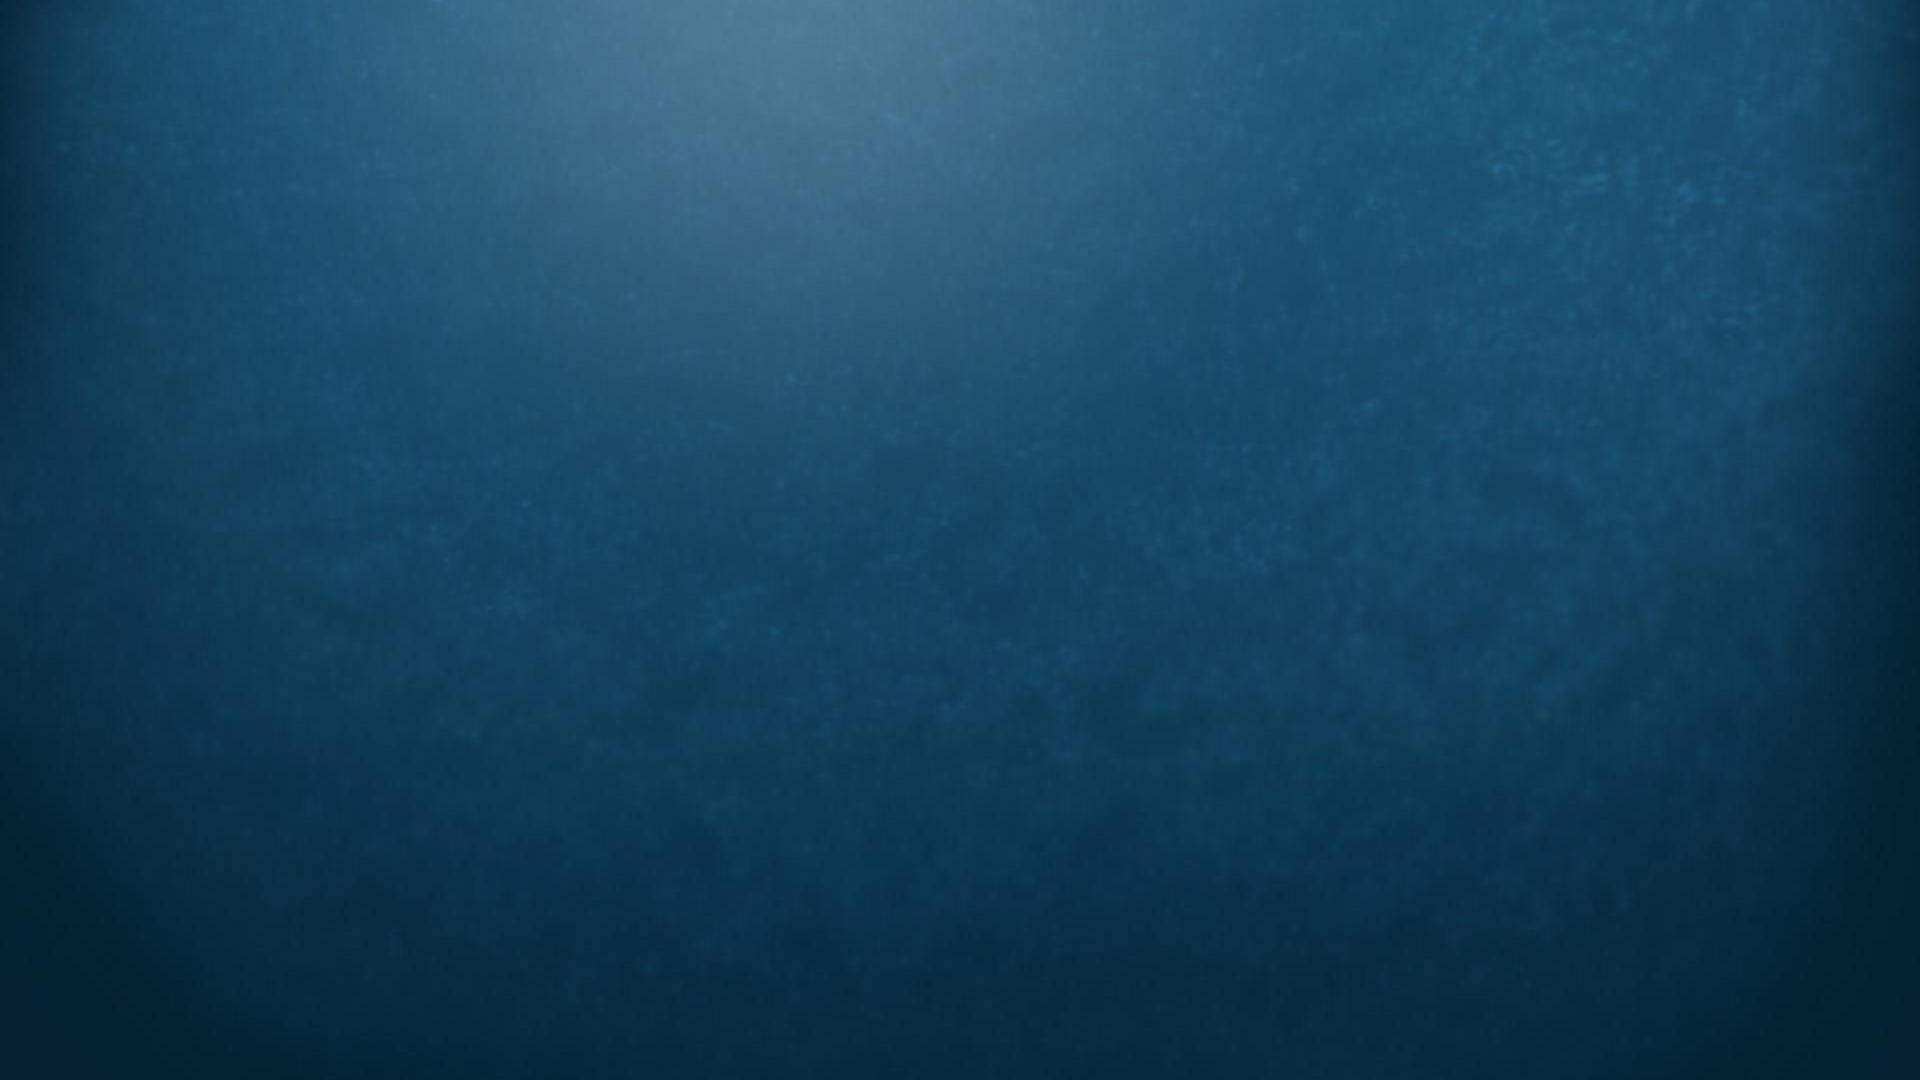 bluewallpapersnetwallpapers1920x1080abstract blue gradientjpg 1920x1080